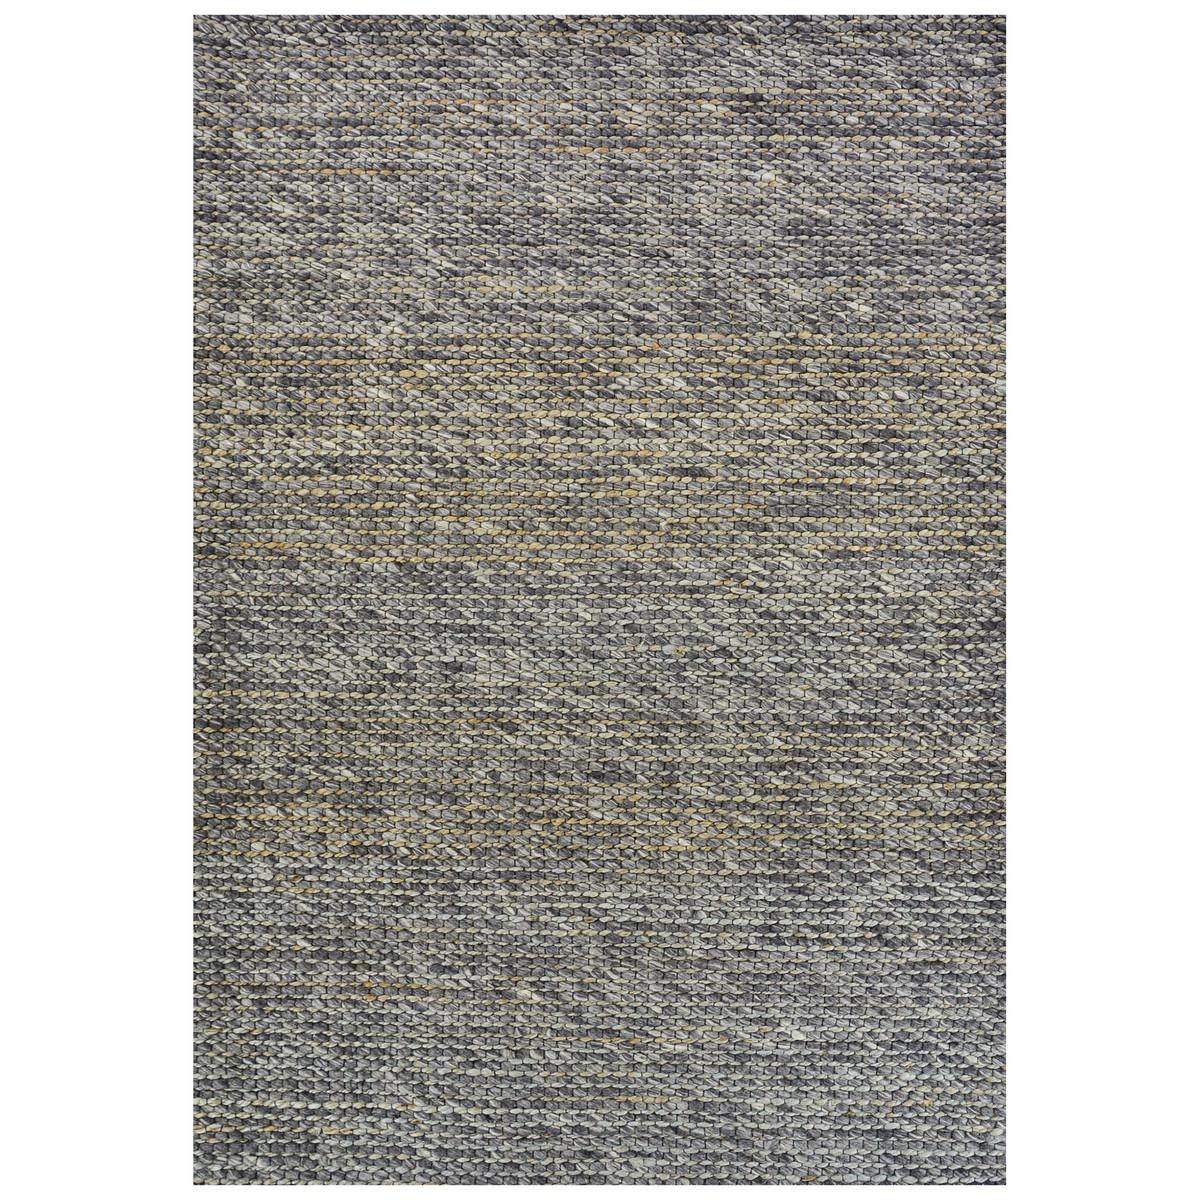 Choti Handmade Wool & Jute Rug, 160x230cm